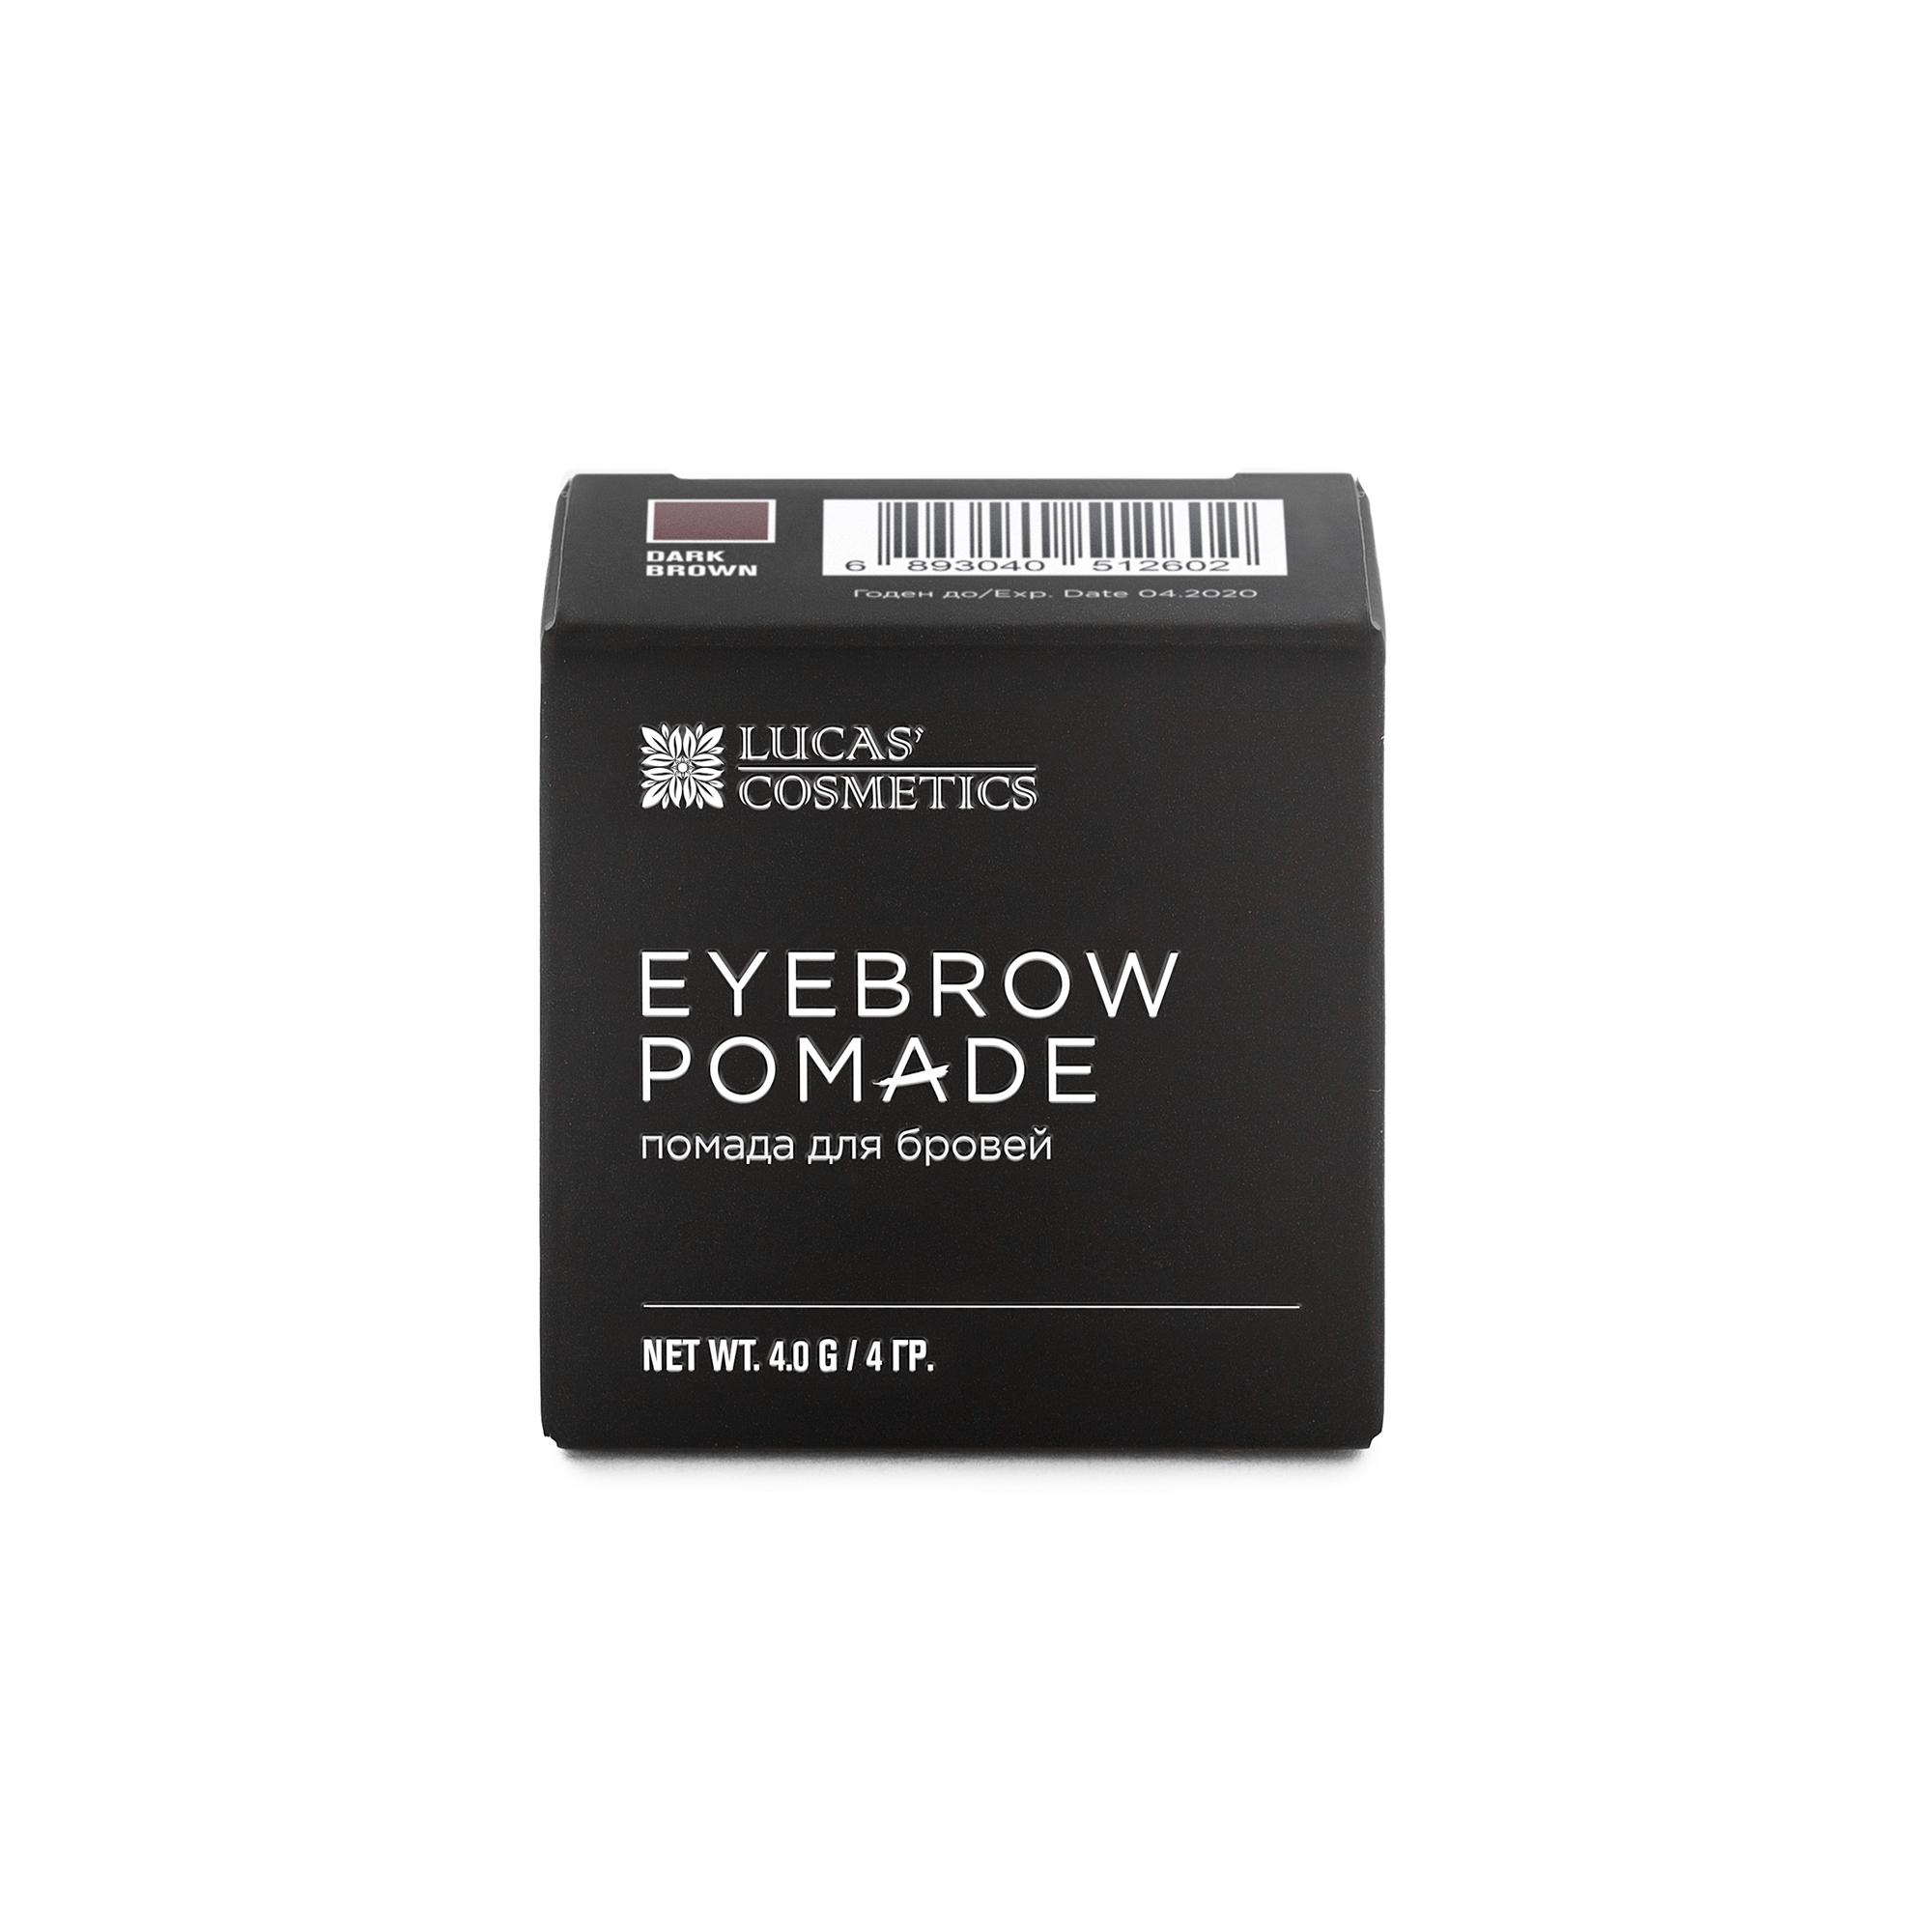 LUCAS' COSMETICS Помада для бровей (темно-коричневый) / Brow pomade Lucas' Cosmetics (dark brown), 4 гр